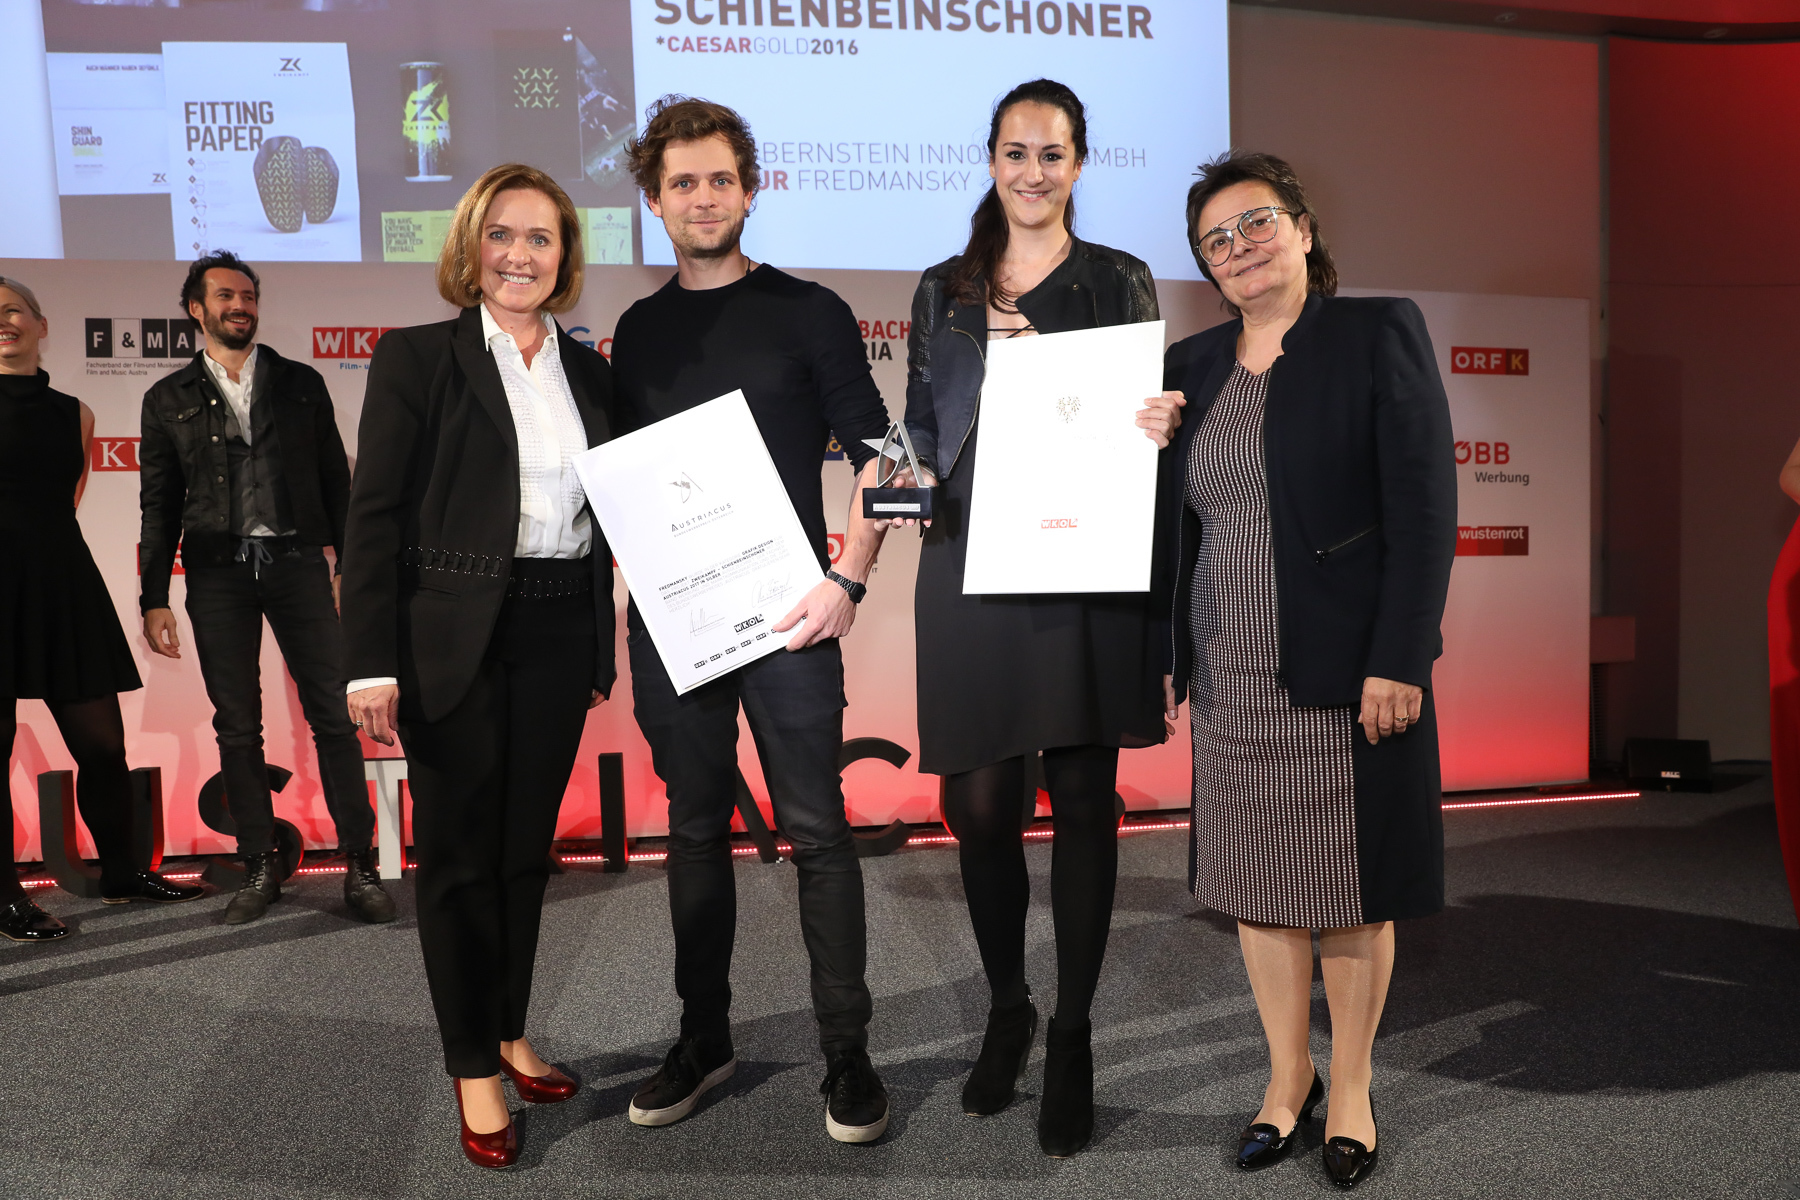 Fredmansky Werbepreis Austriacus